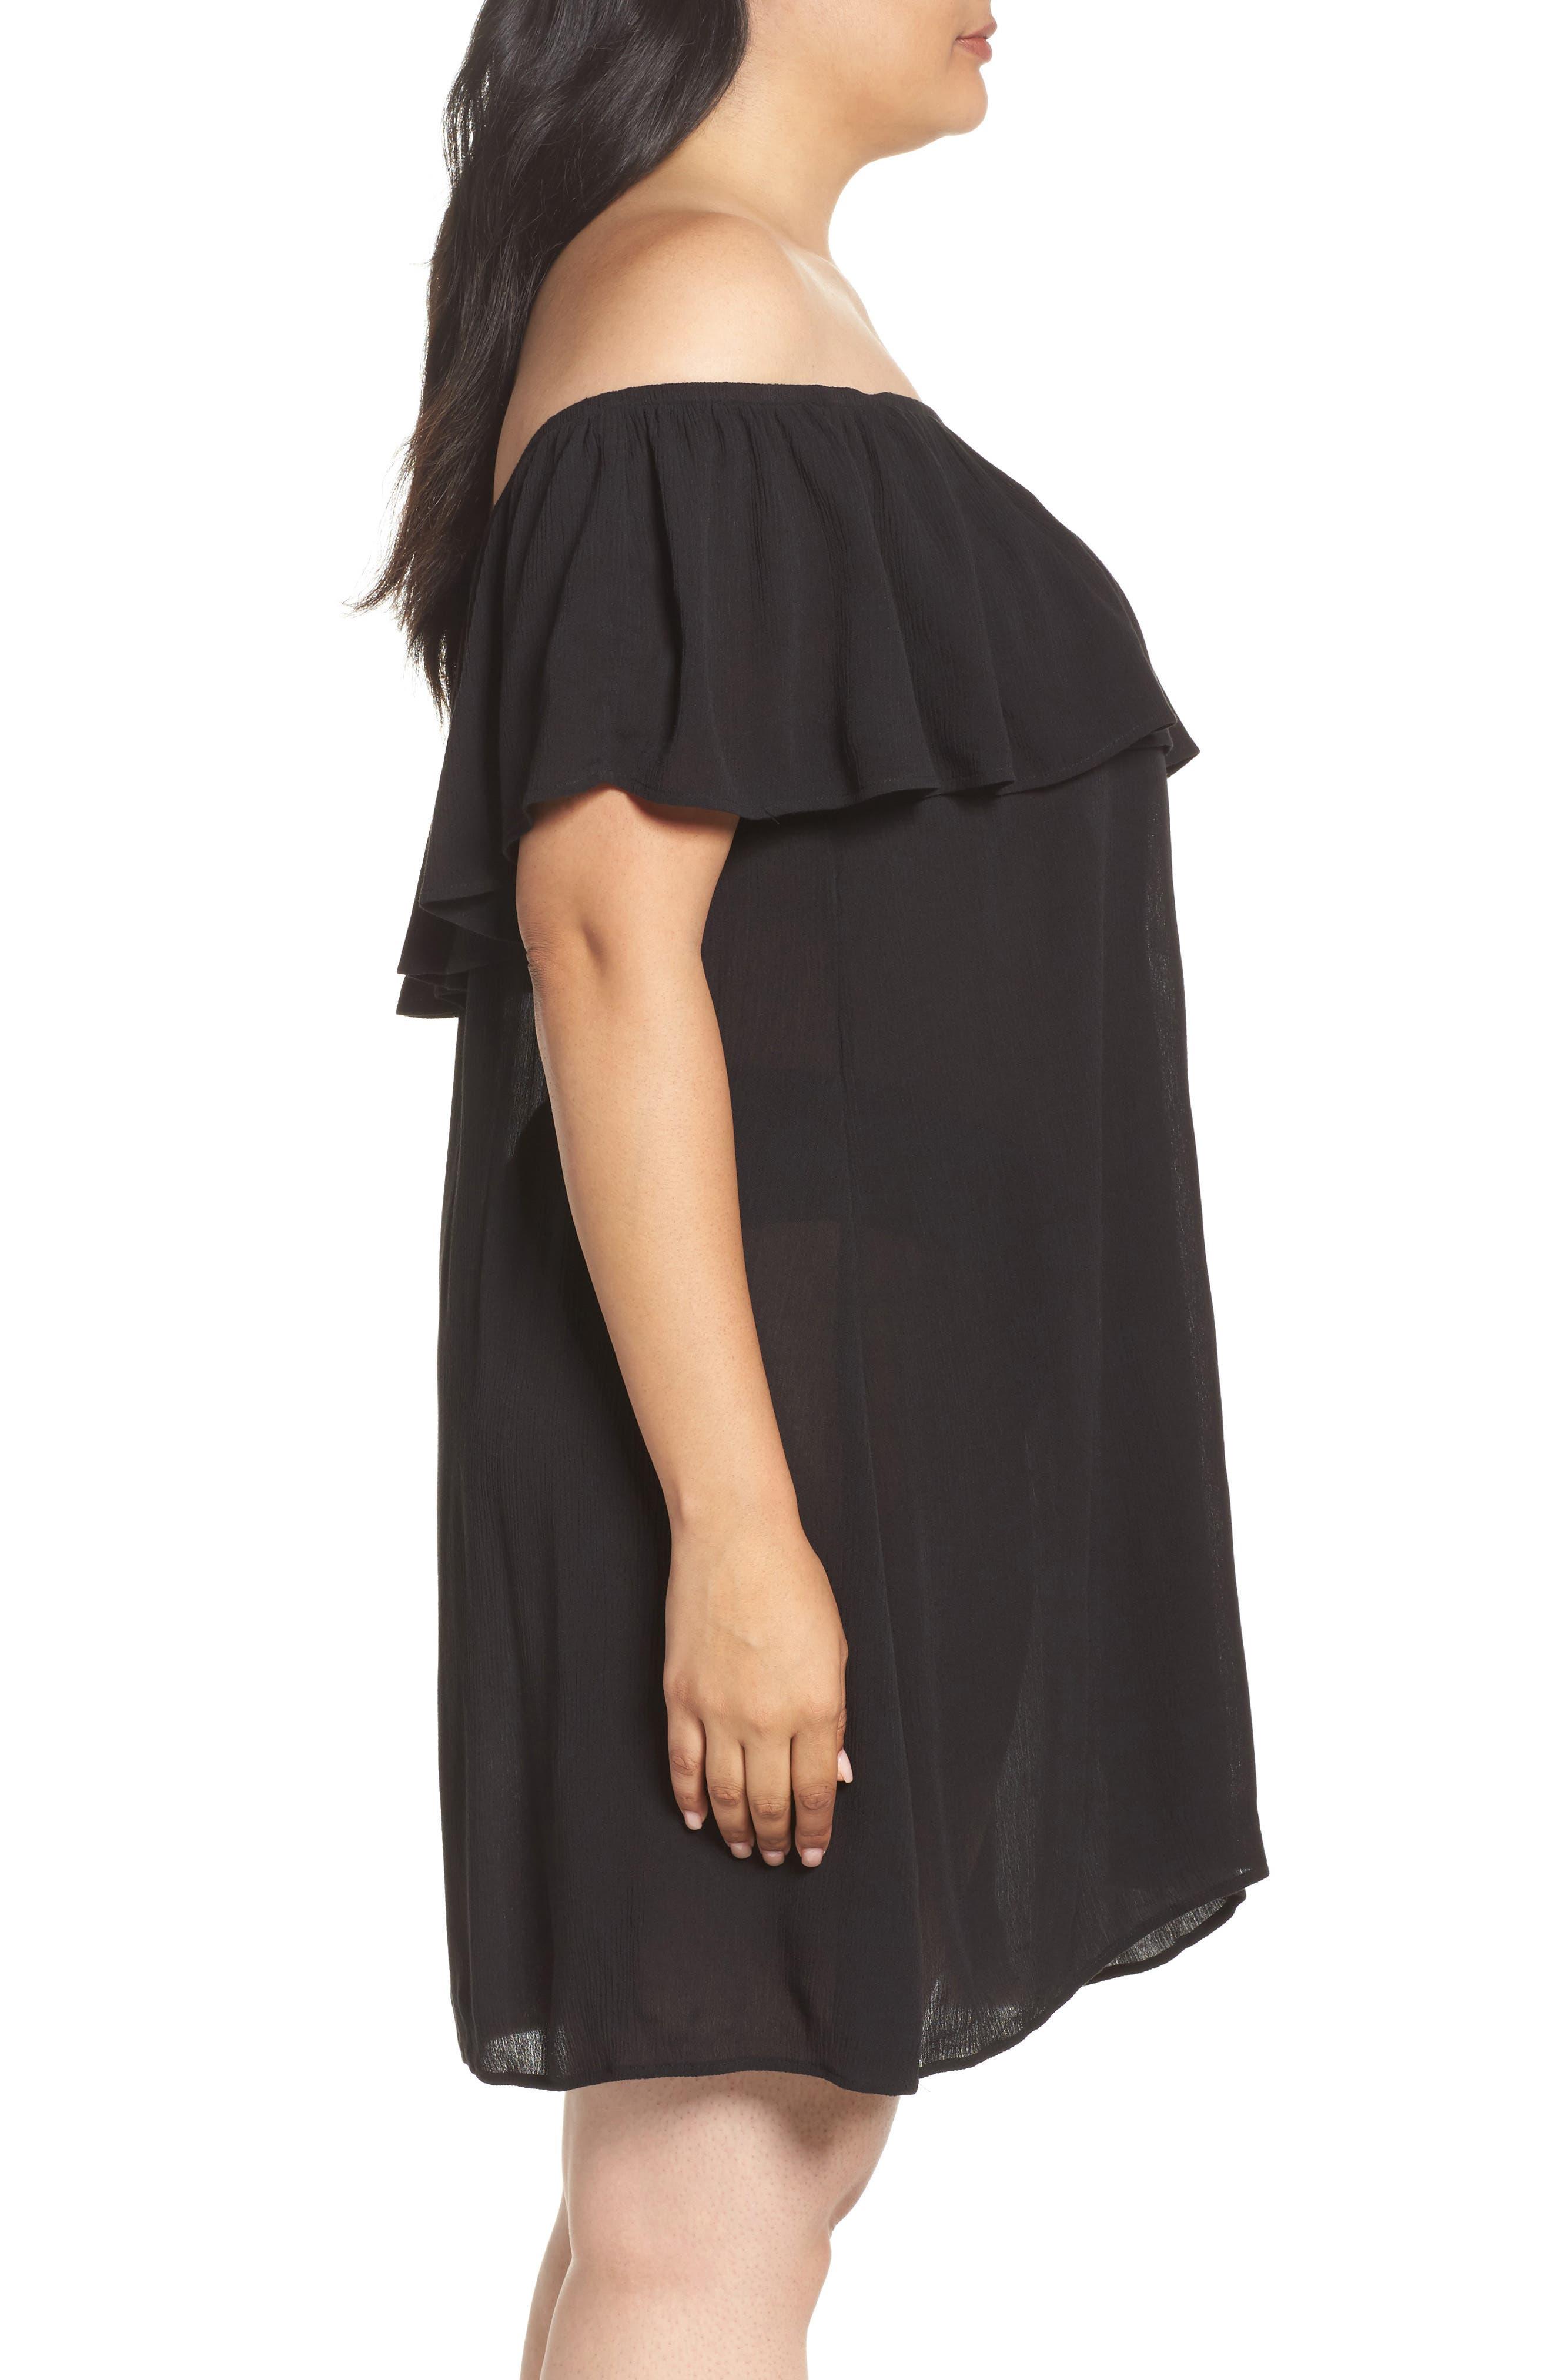 Alternate Image 3  - Becca Etc. Southern Belle Off the Shoulder Cover-Up Dress (Plus Size)